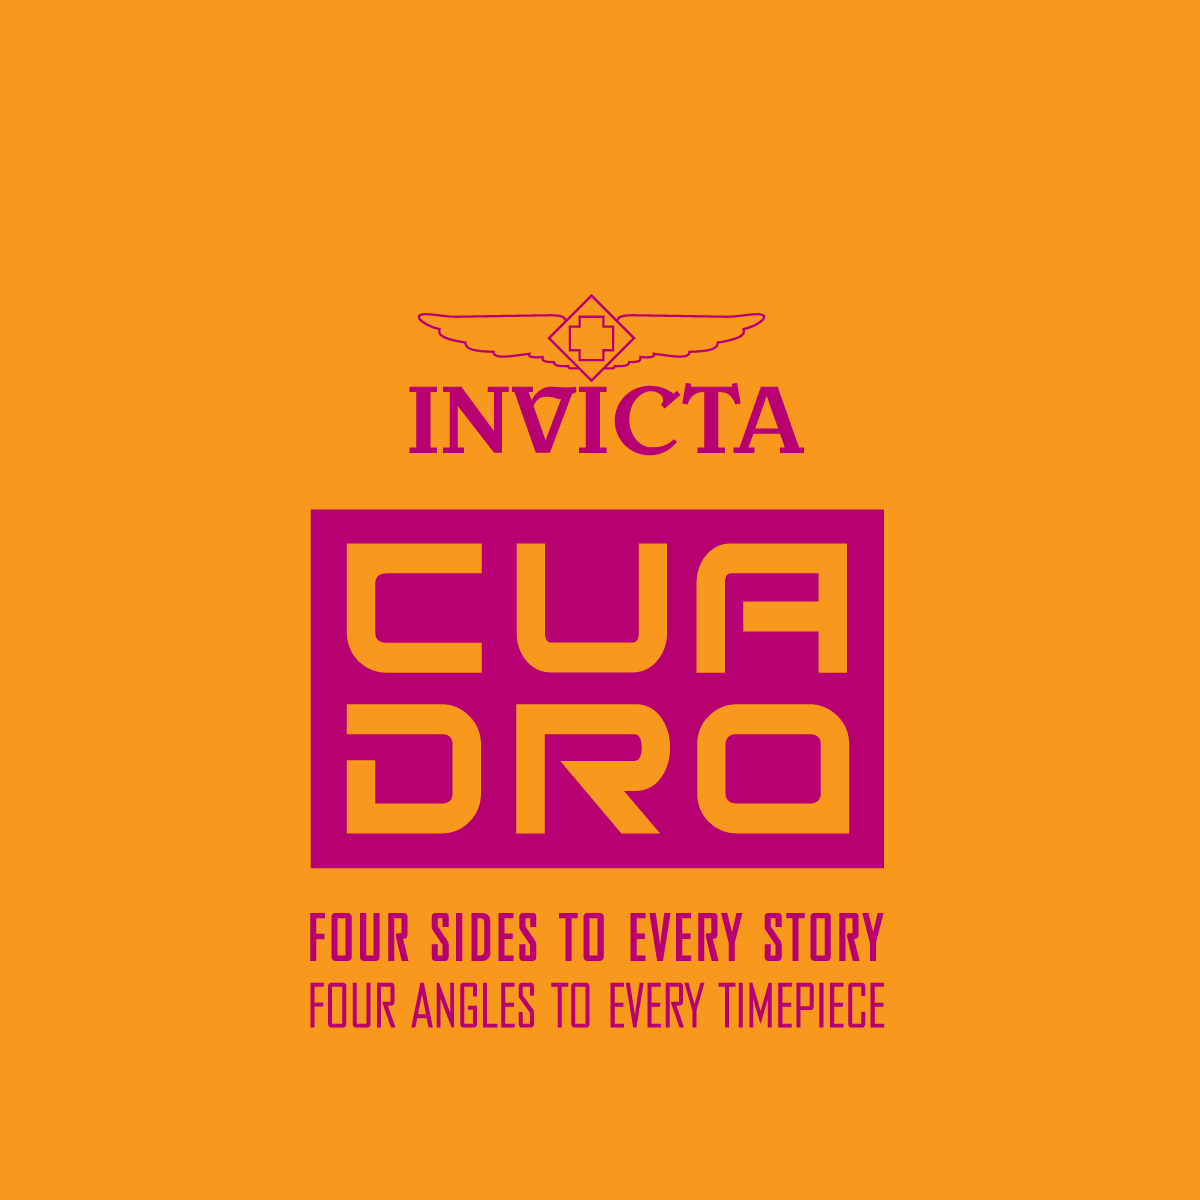 IN-45-Cuadro-Logo-05-MainColors-CMYK.jpg